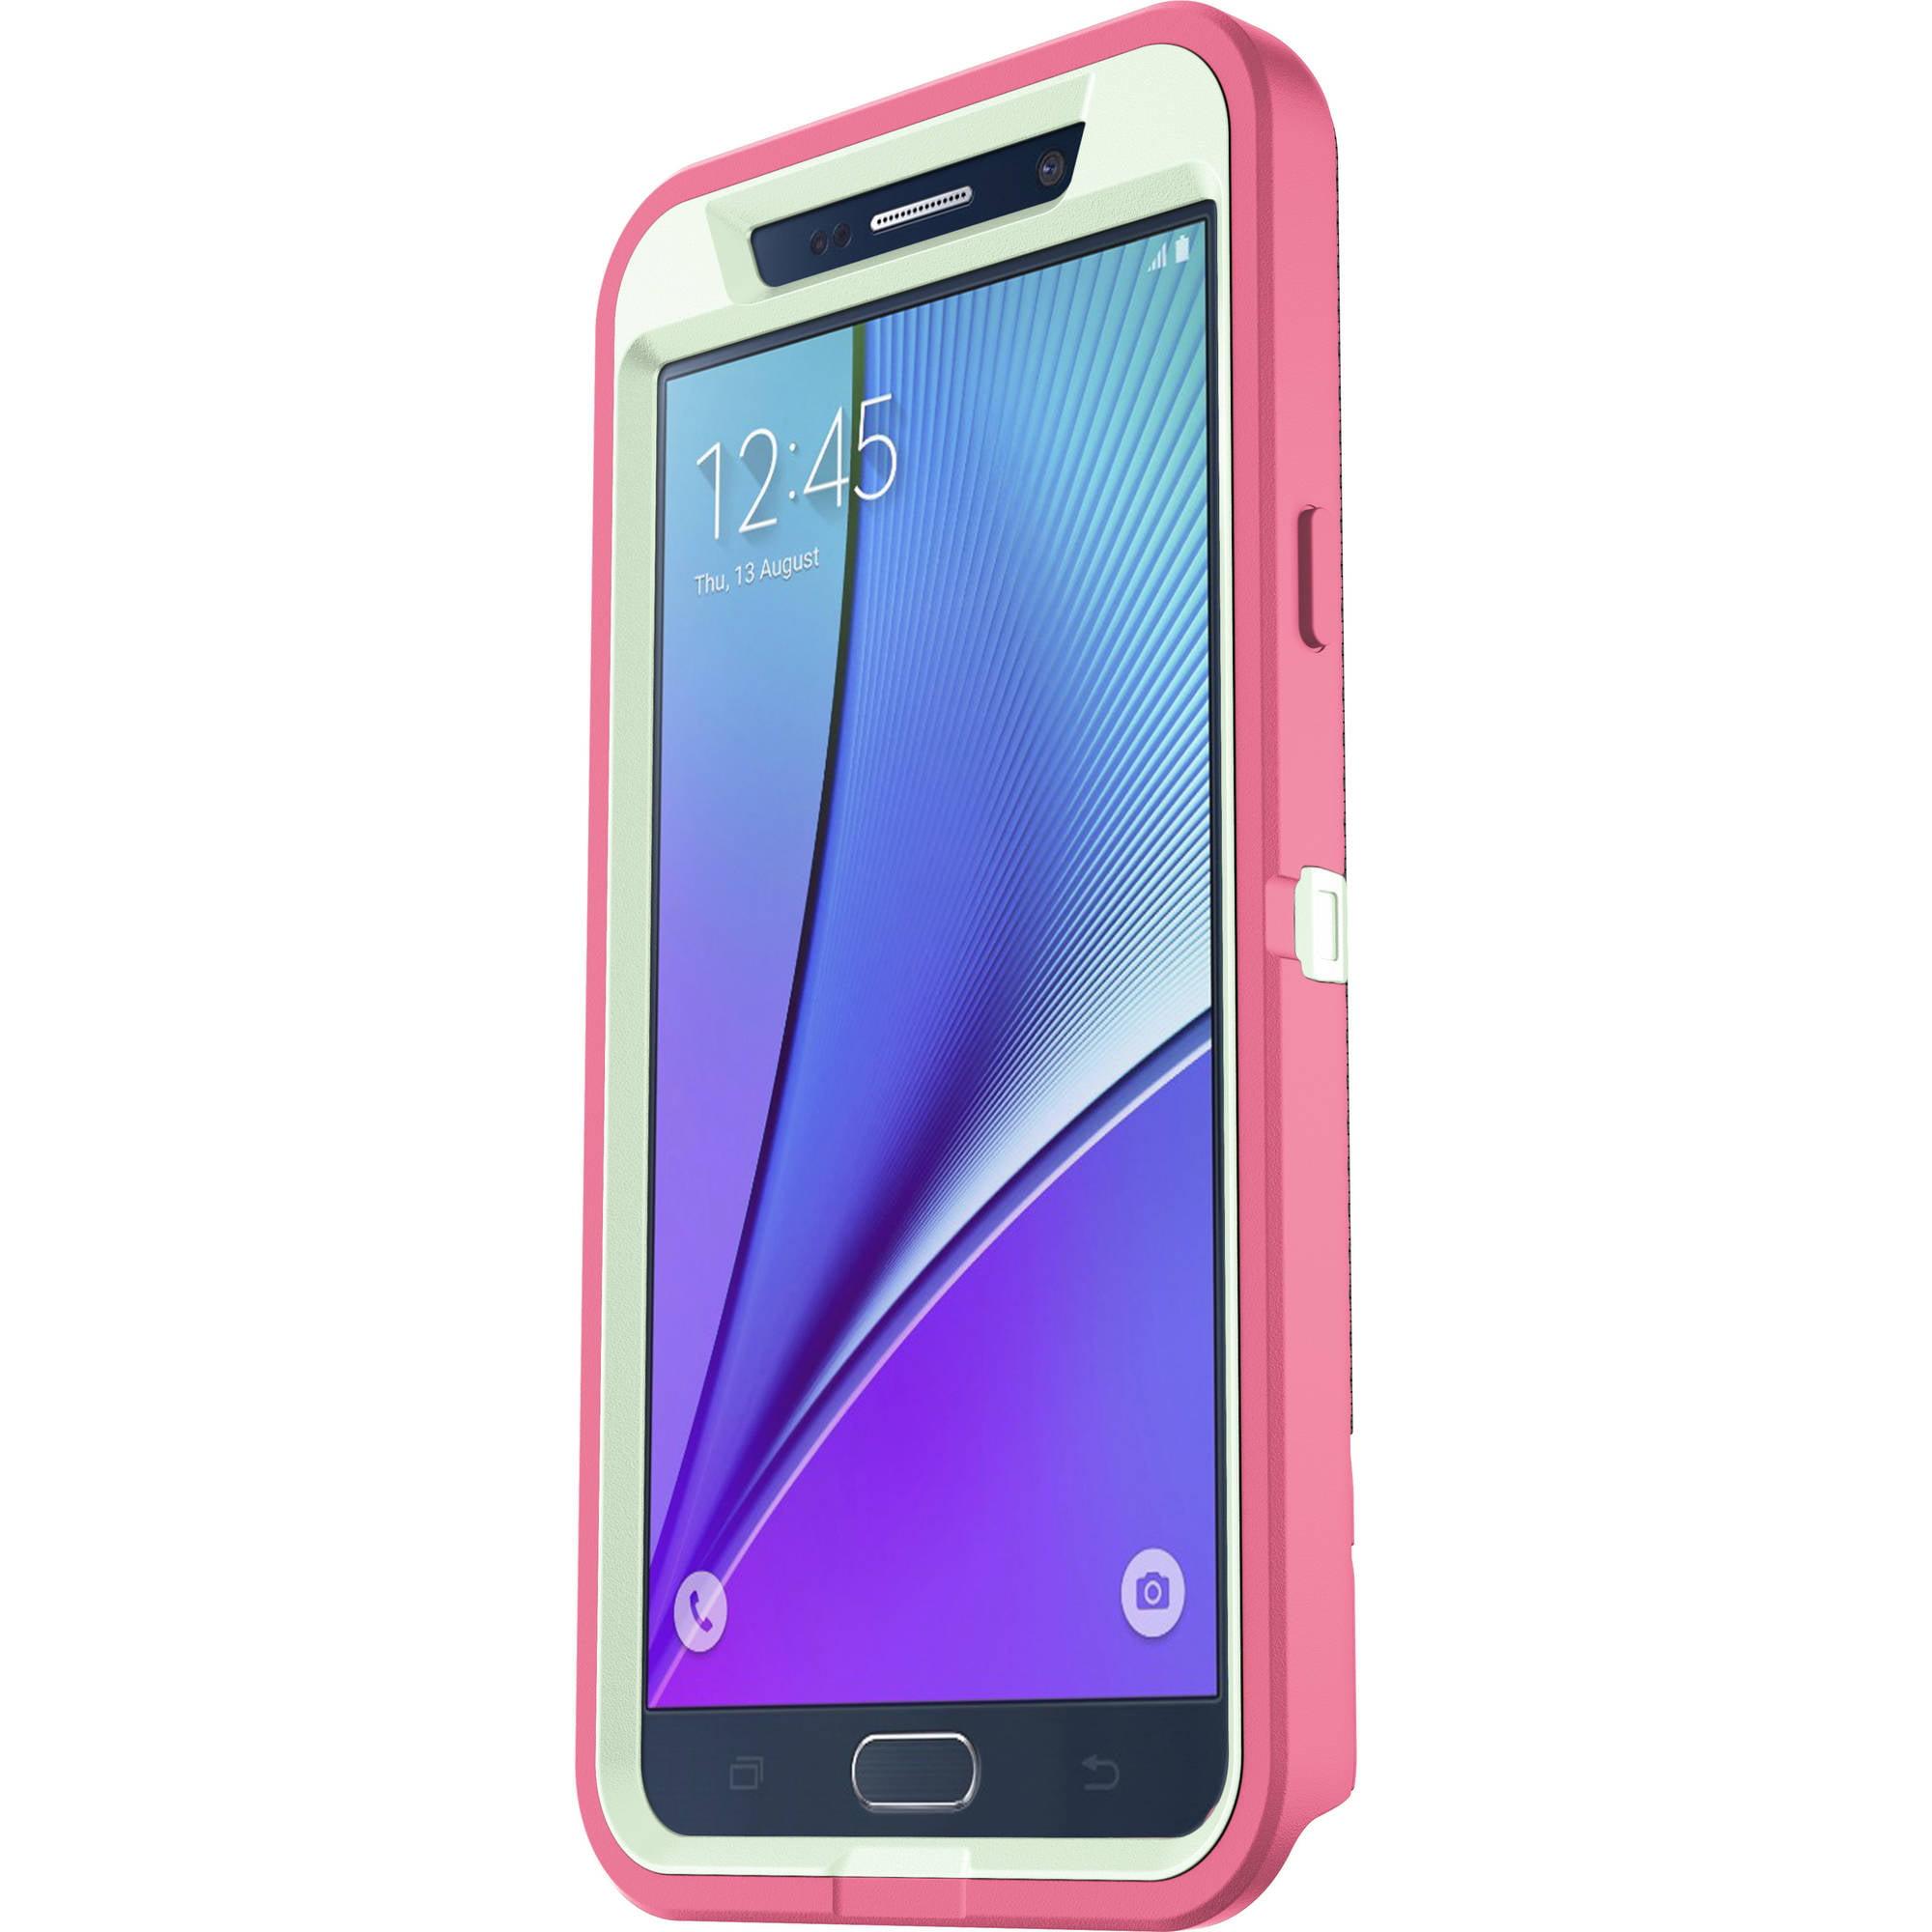 competitive price 19e9f d2020 OtterBox Defender Case for Samsung Galaxy Note5, Melon Pop